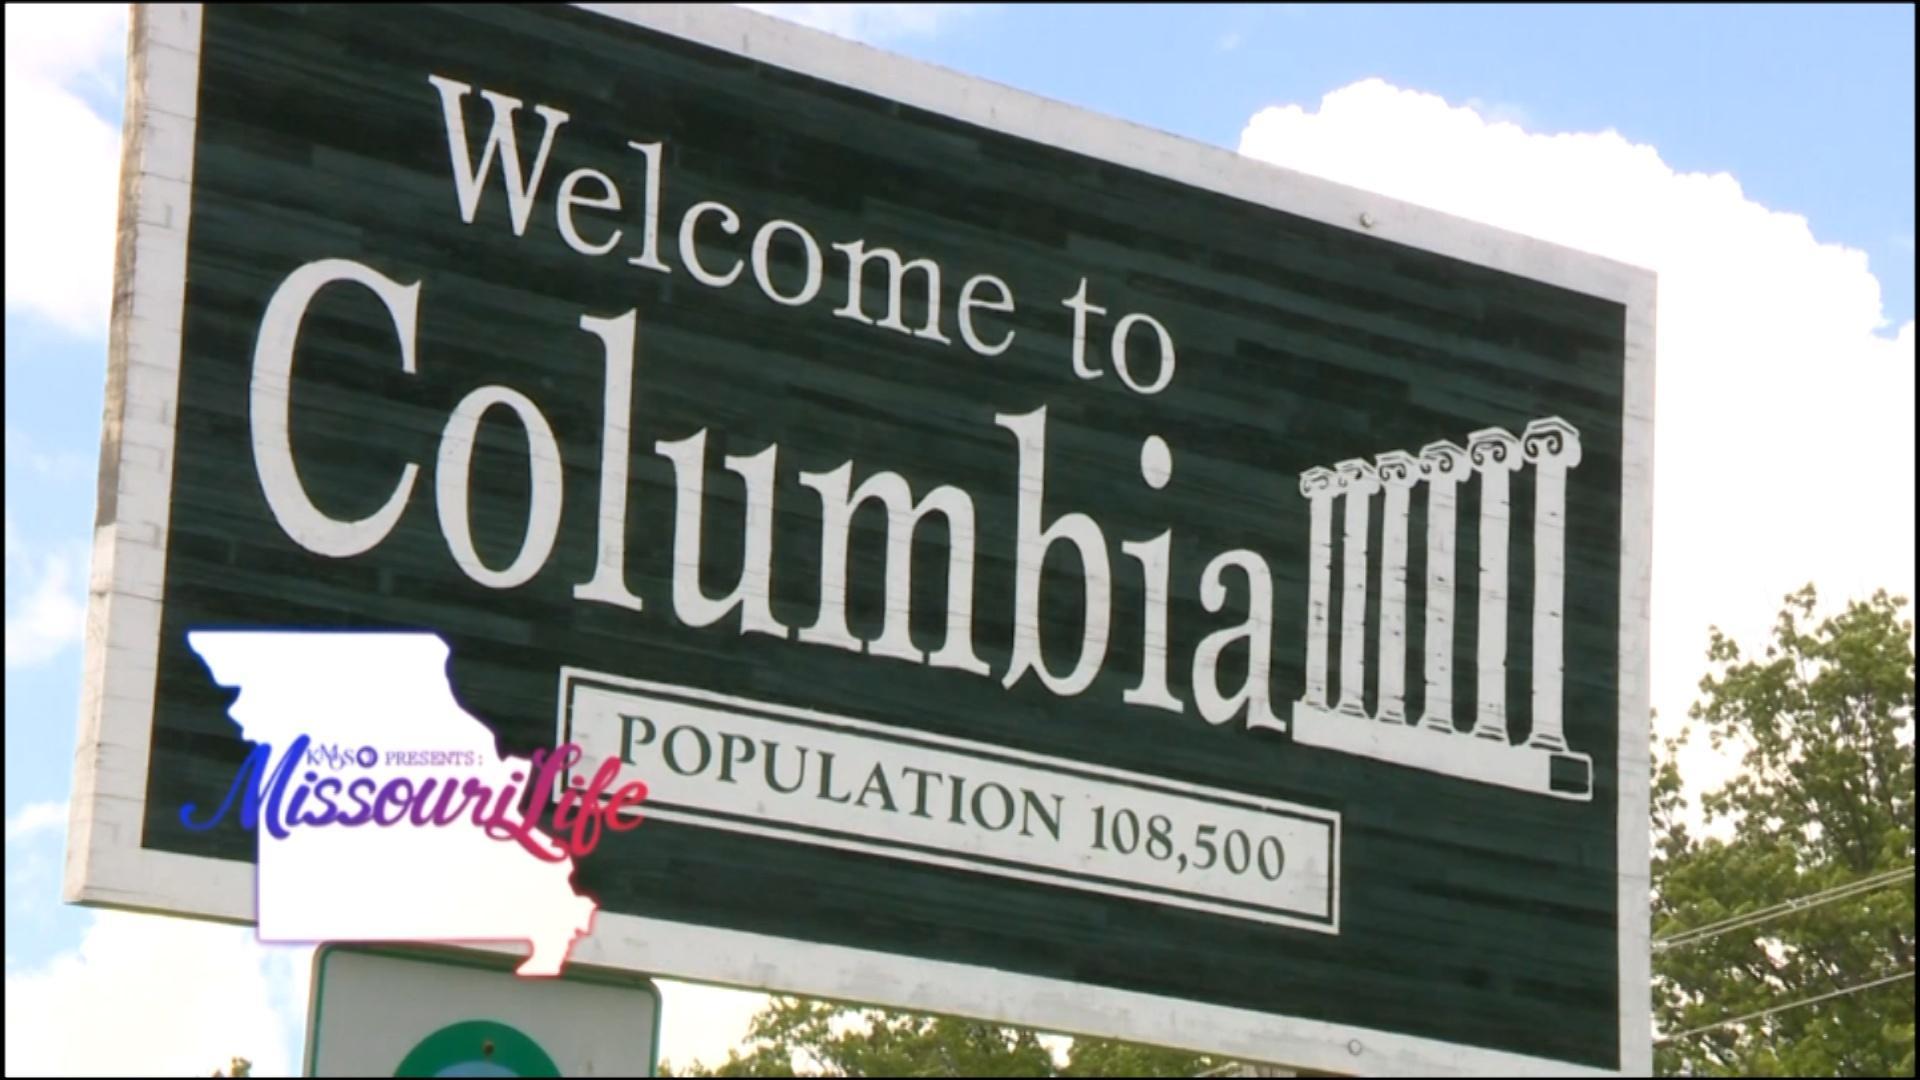 KMOS Presents Missouri Life Columbia